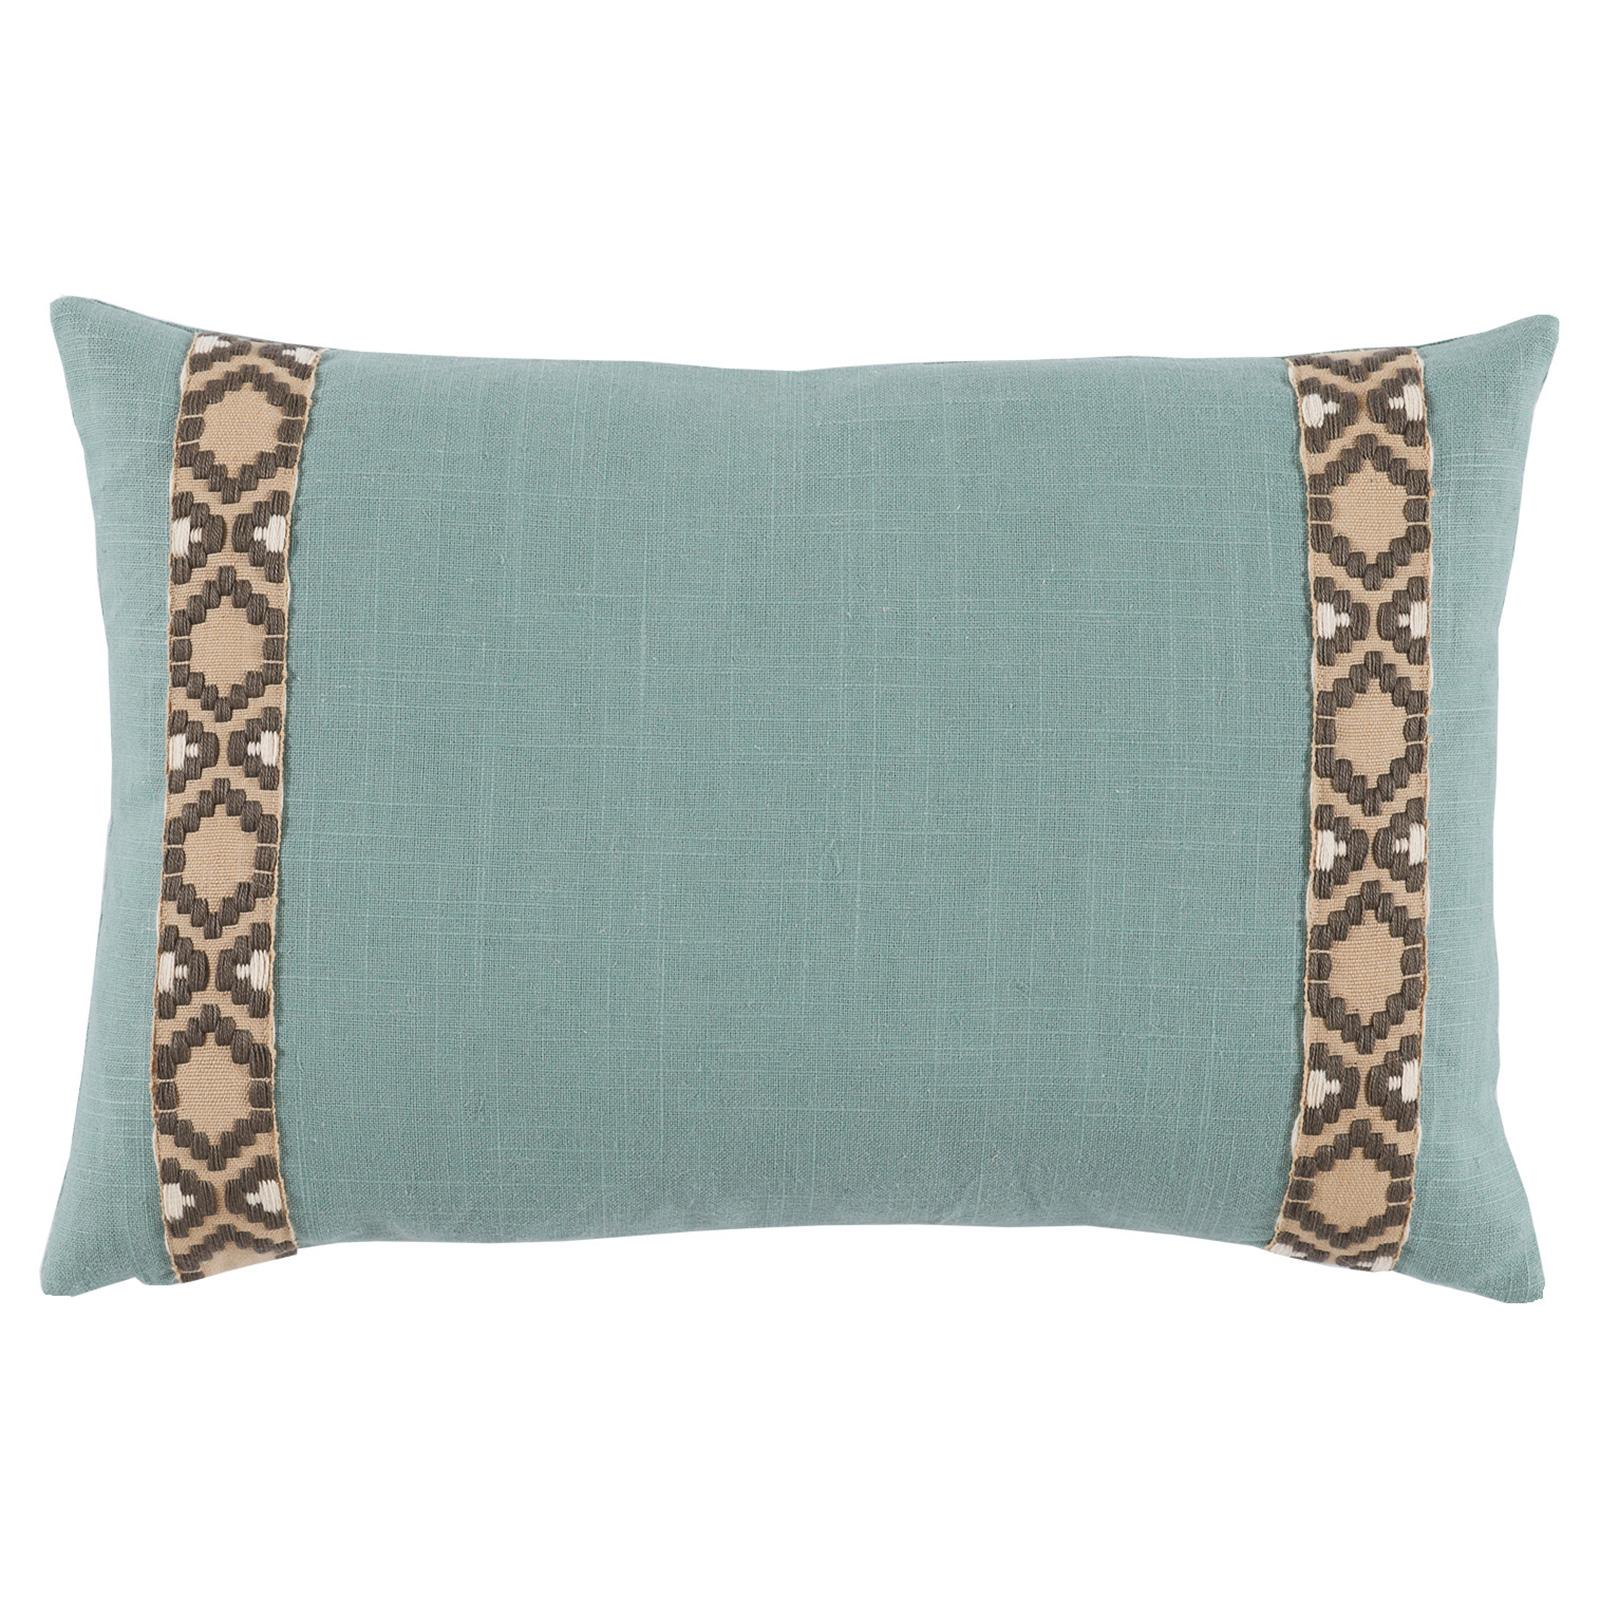 Kaia Global Marine Blue Linen Trim Band Pillow - 13x19